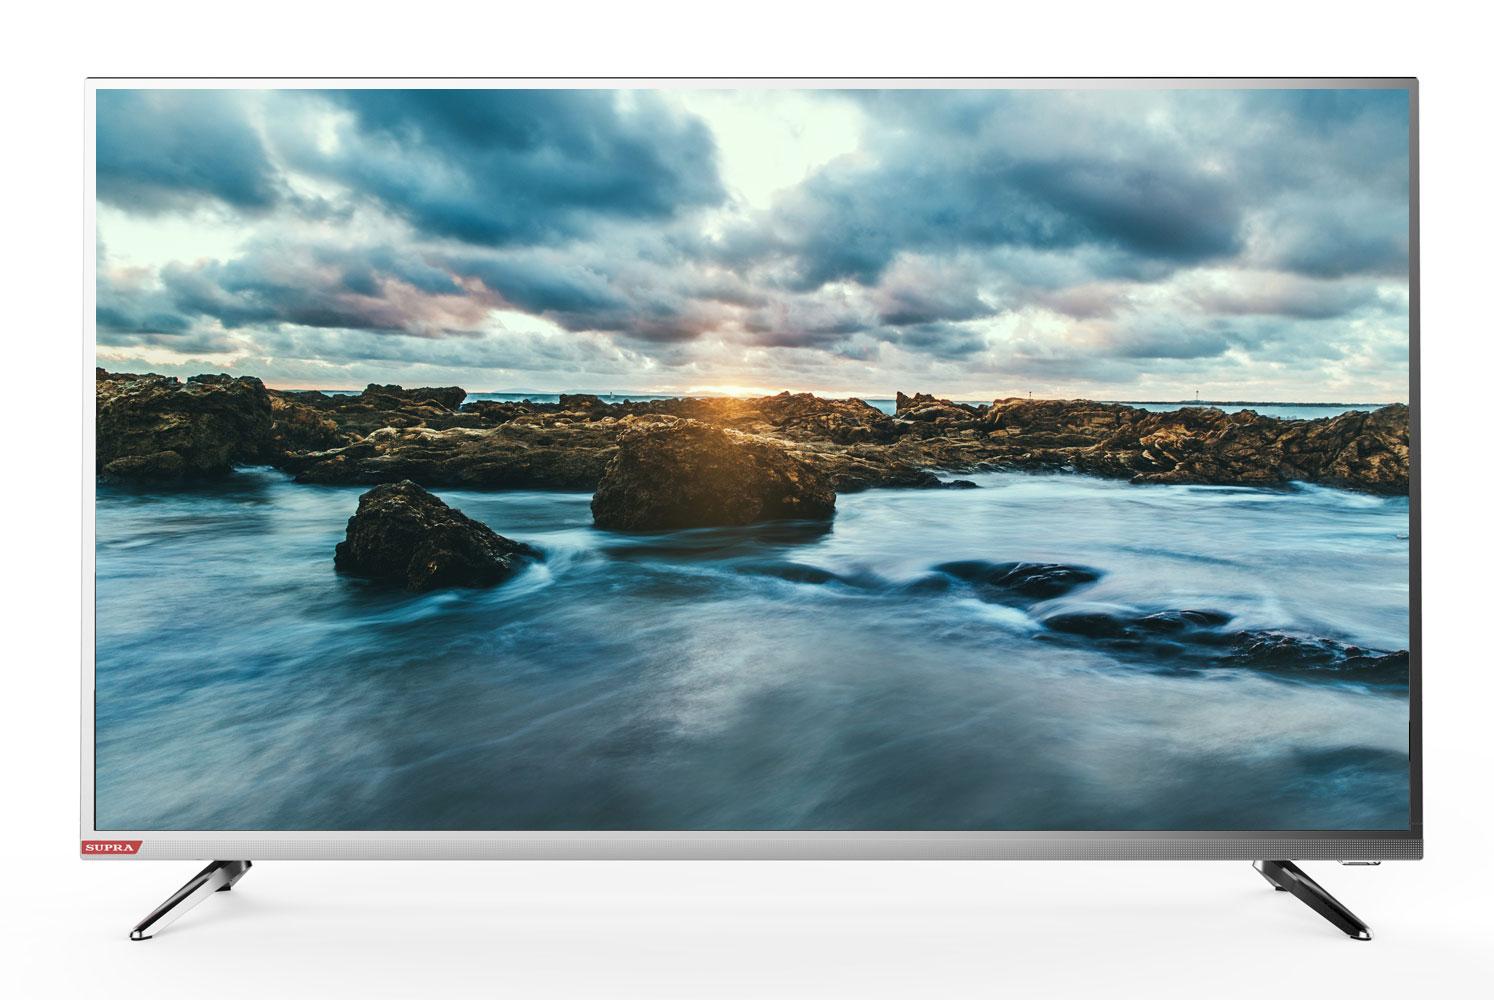 Телевизор SUPRA STV-LC32LT0011W LED 32 Silver, 16:9, 1366x768, 100000:1, 260 кд/м2, USB, AV, 3xHDMI, DVB-T2, C waterproof 50x 4 led usb microscope silver